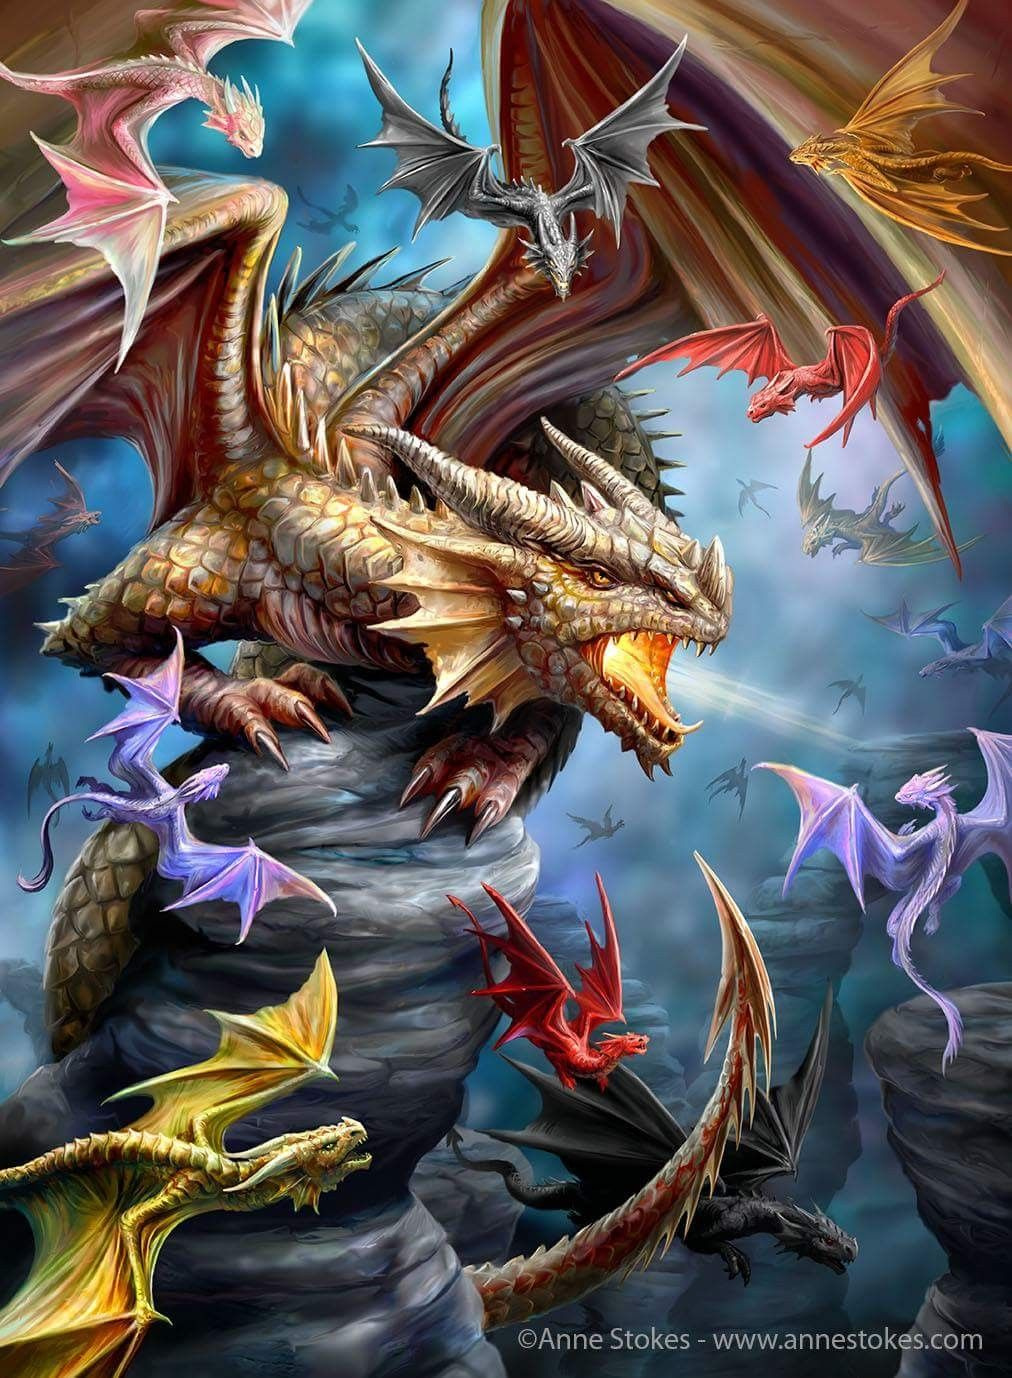 картинки с симпатичными драконами